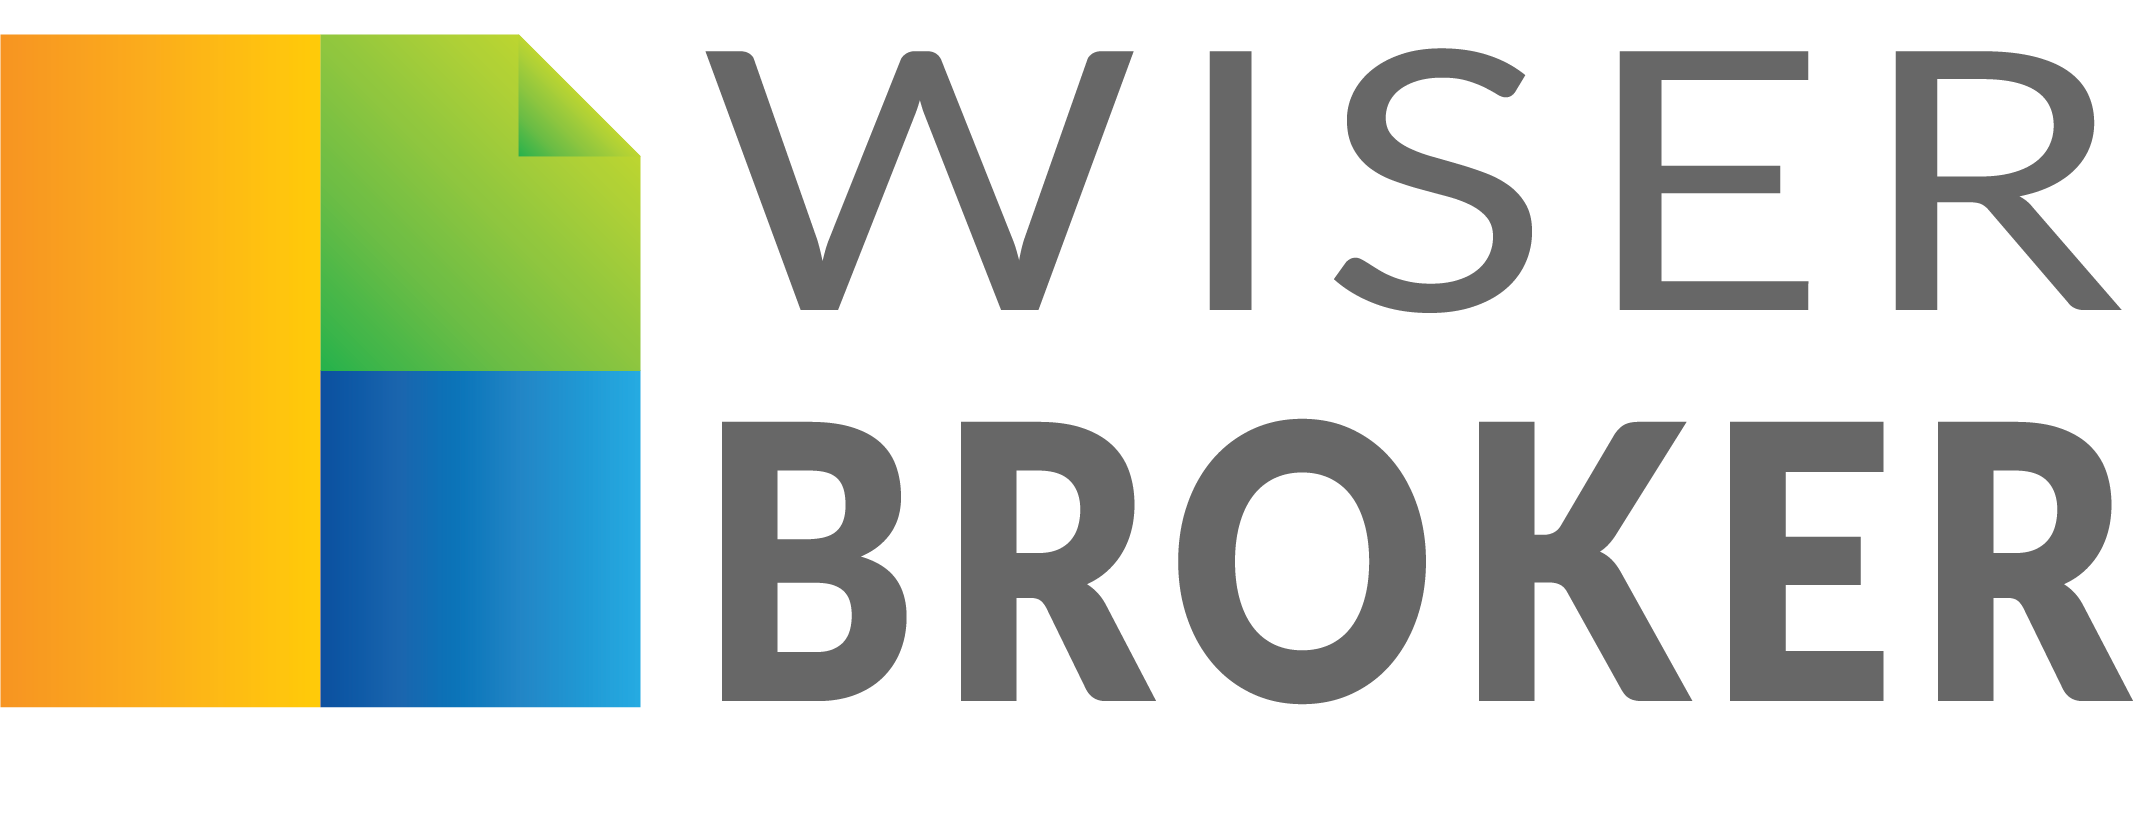 Wiser Broker